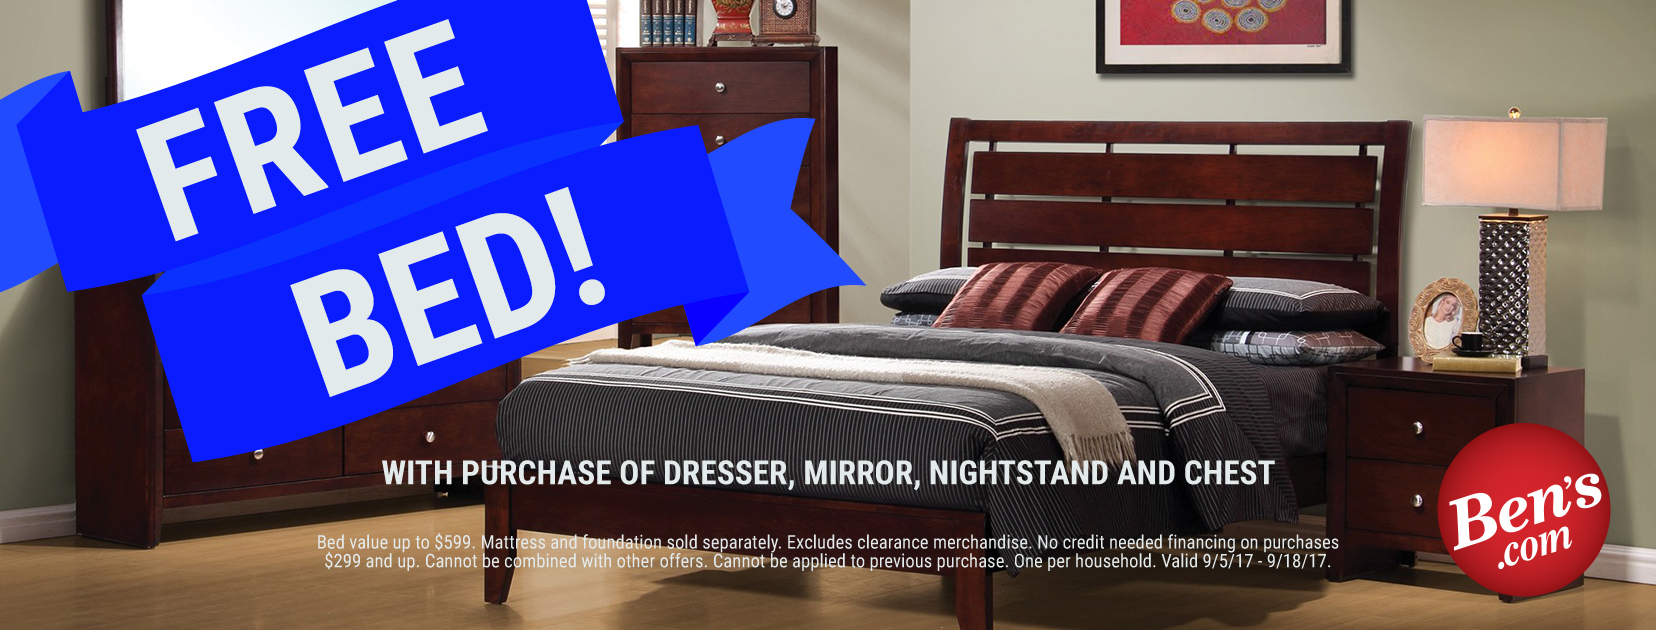 Atlanta's #1 Discount Mattress & Furniture Store